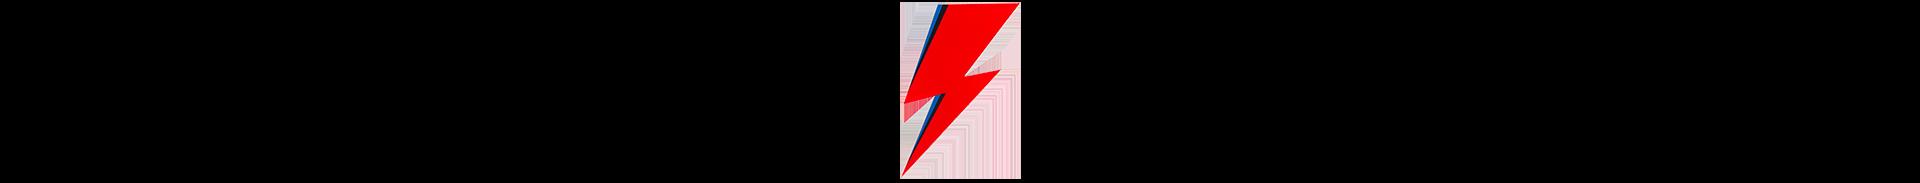 flash-break.png